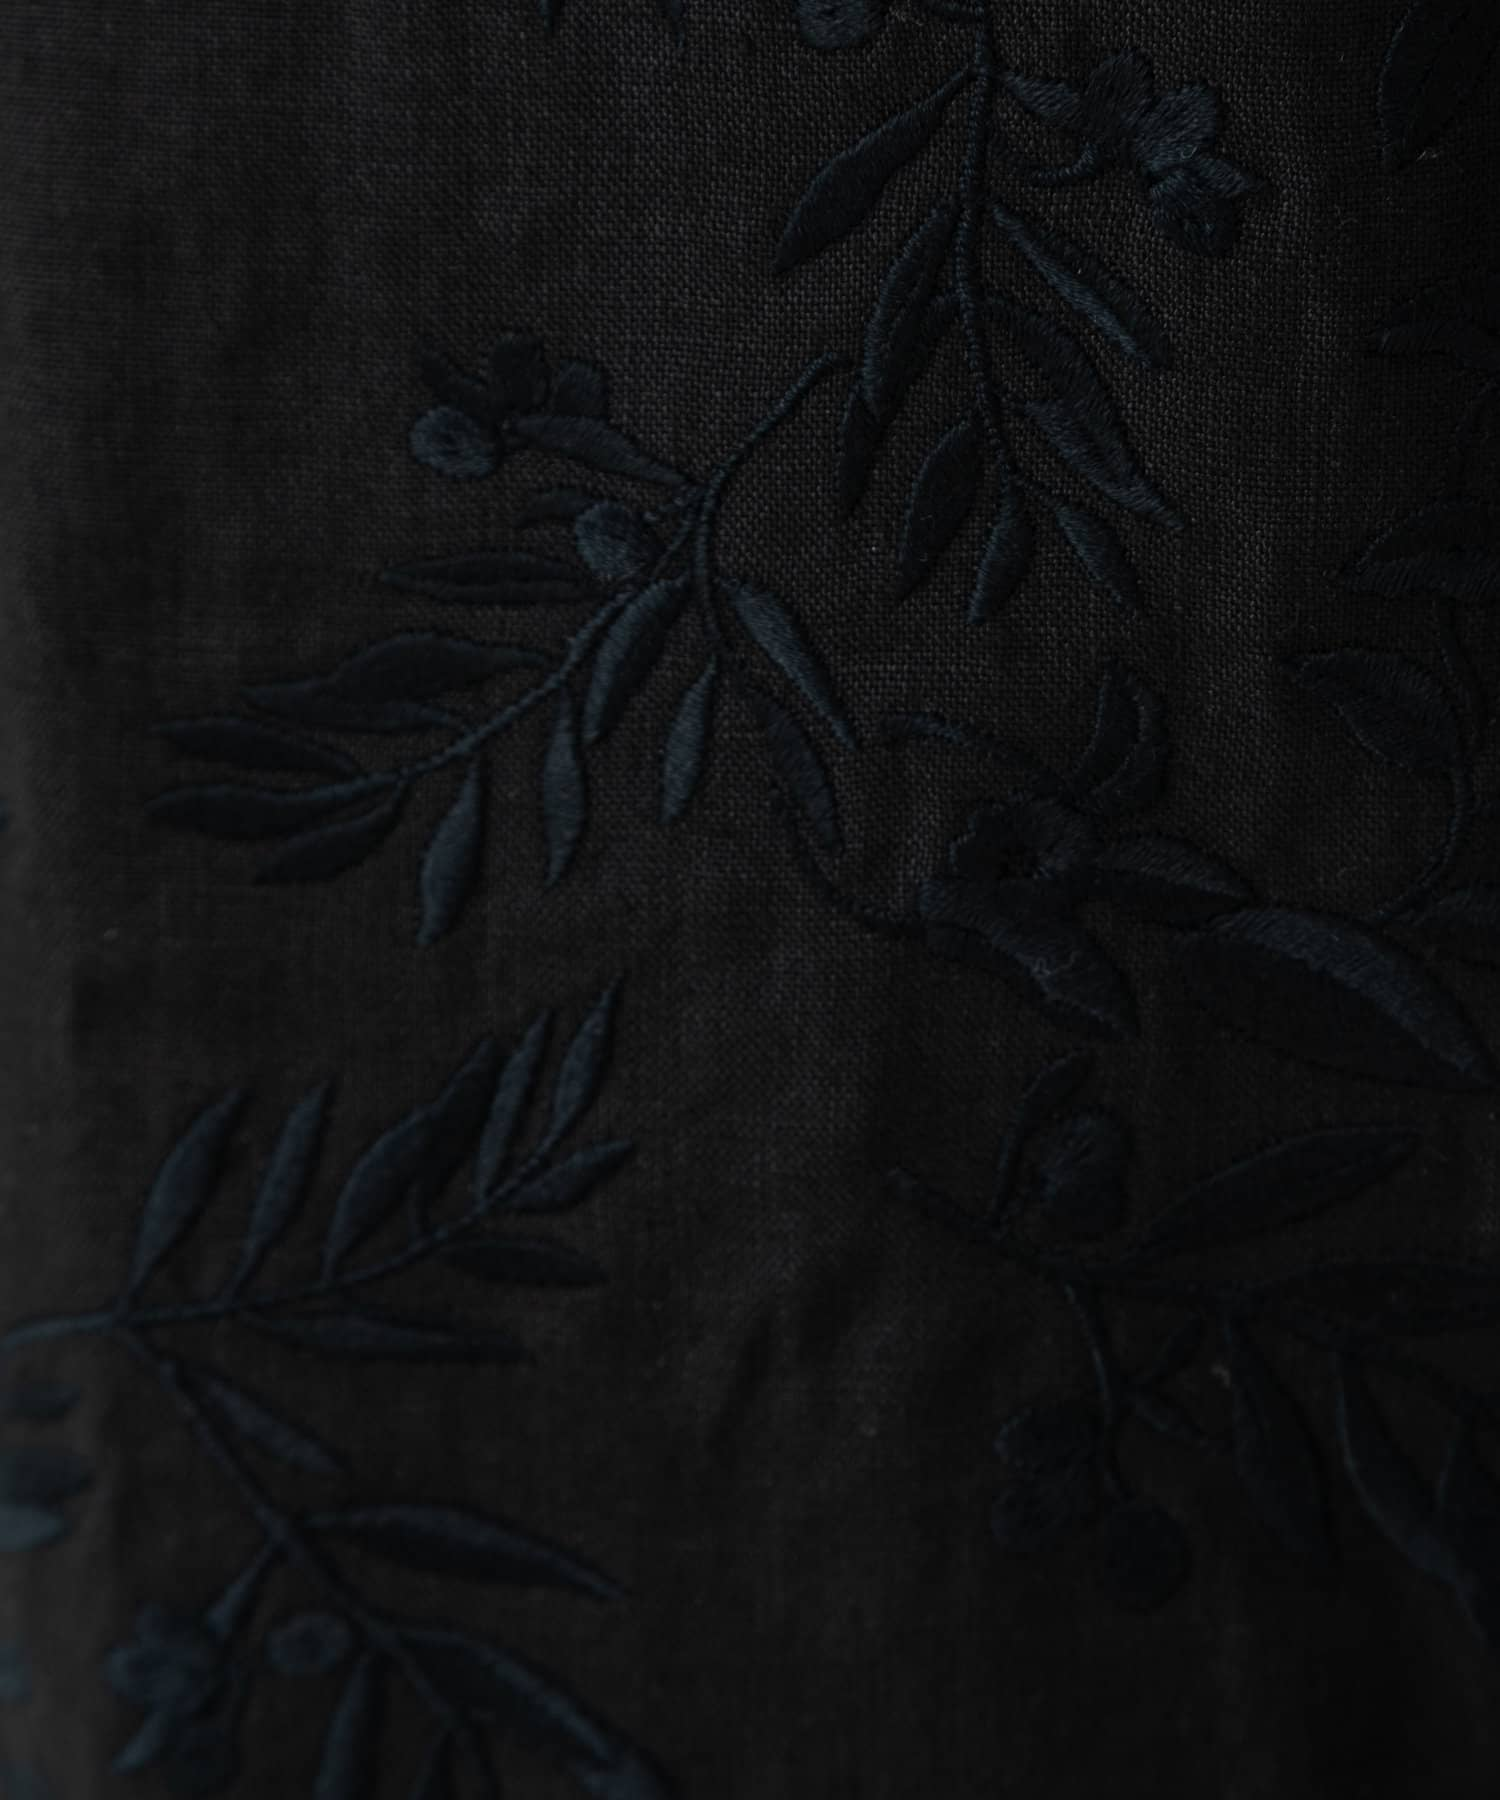 LIVETART(リヴェタート) 《sure feel》オリーブ柄刺繍パンツ 【WEB限定】